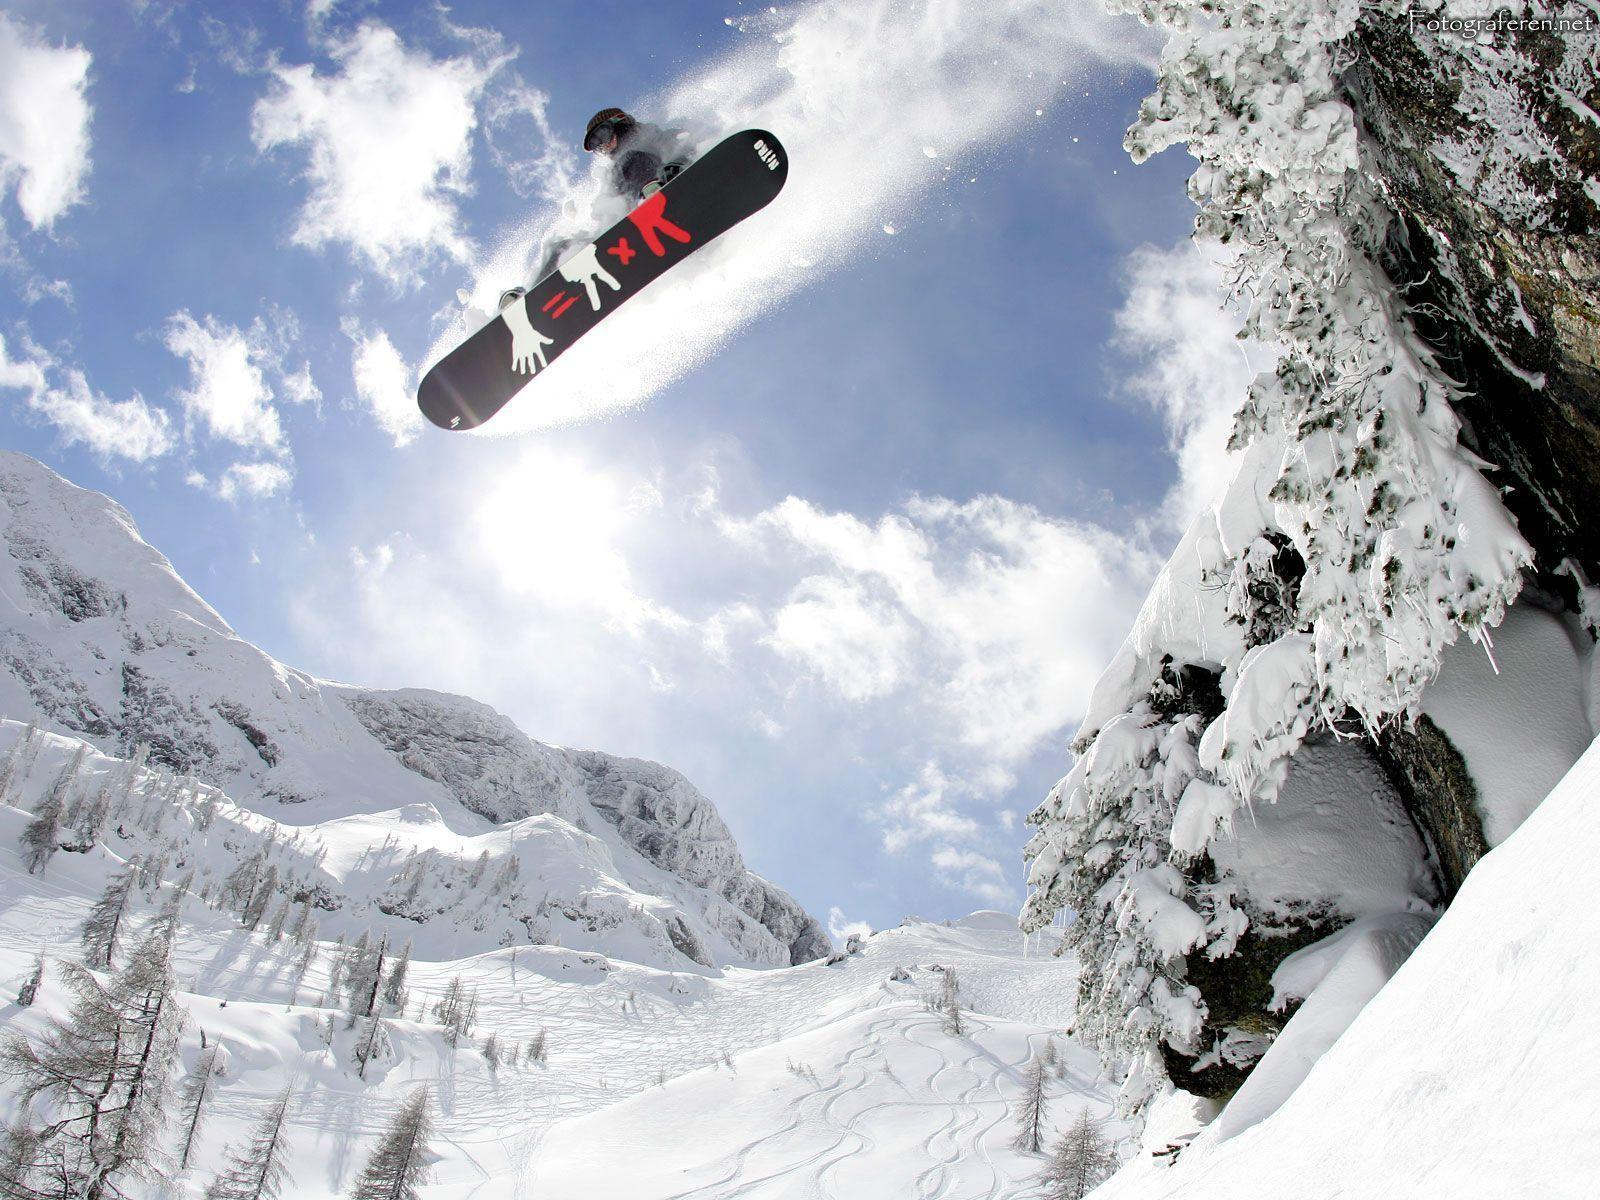 Snowboarding Wallpapers HD - Wallpaper - 328.3KB